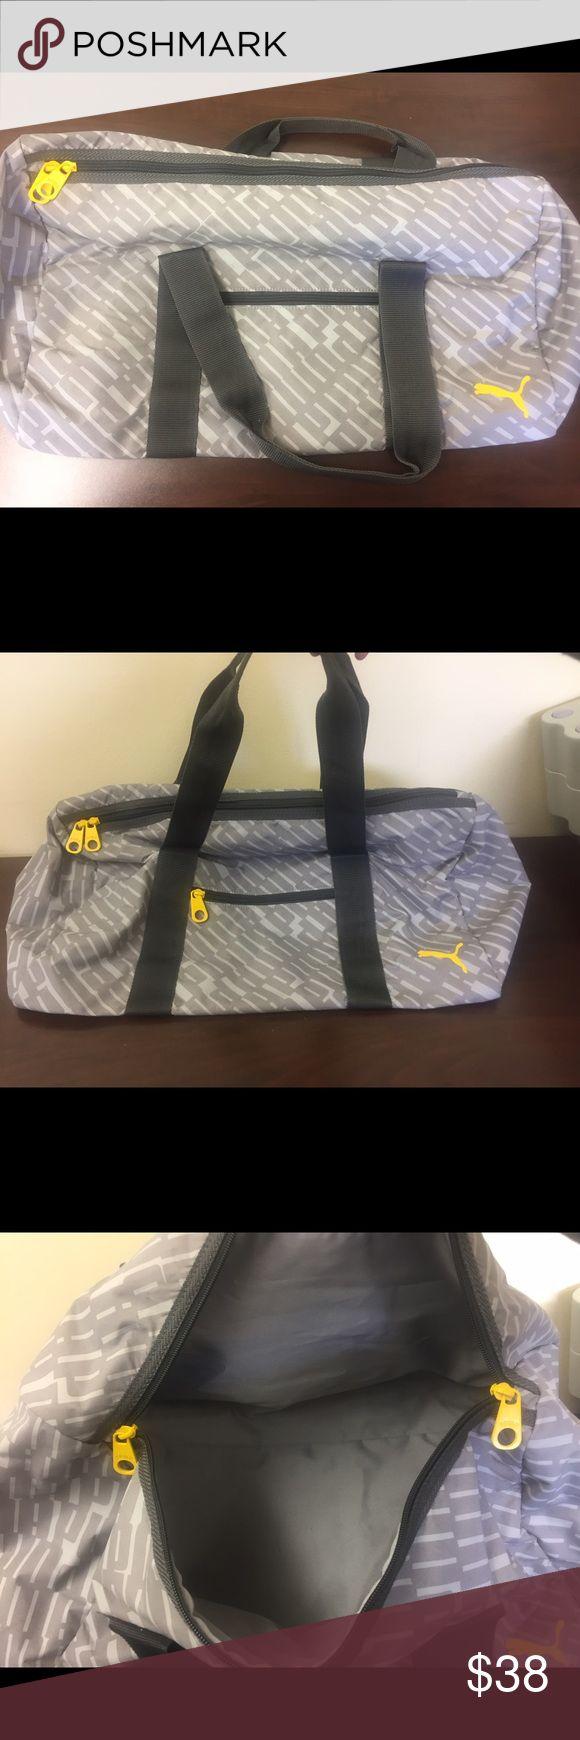 Puma Sports Duffle Bag Gray. Like new, never used. Puma Bags Shoulder Bags